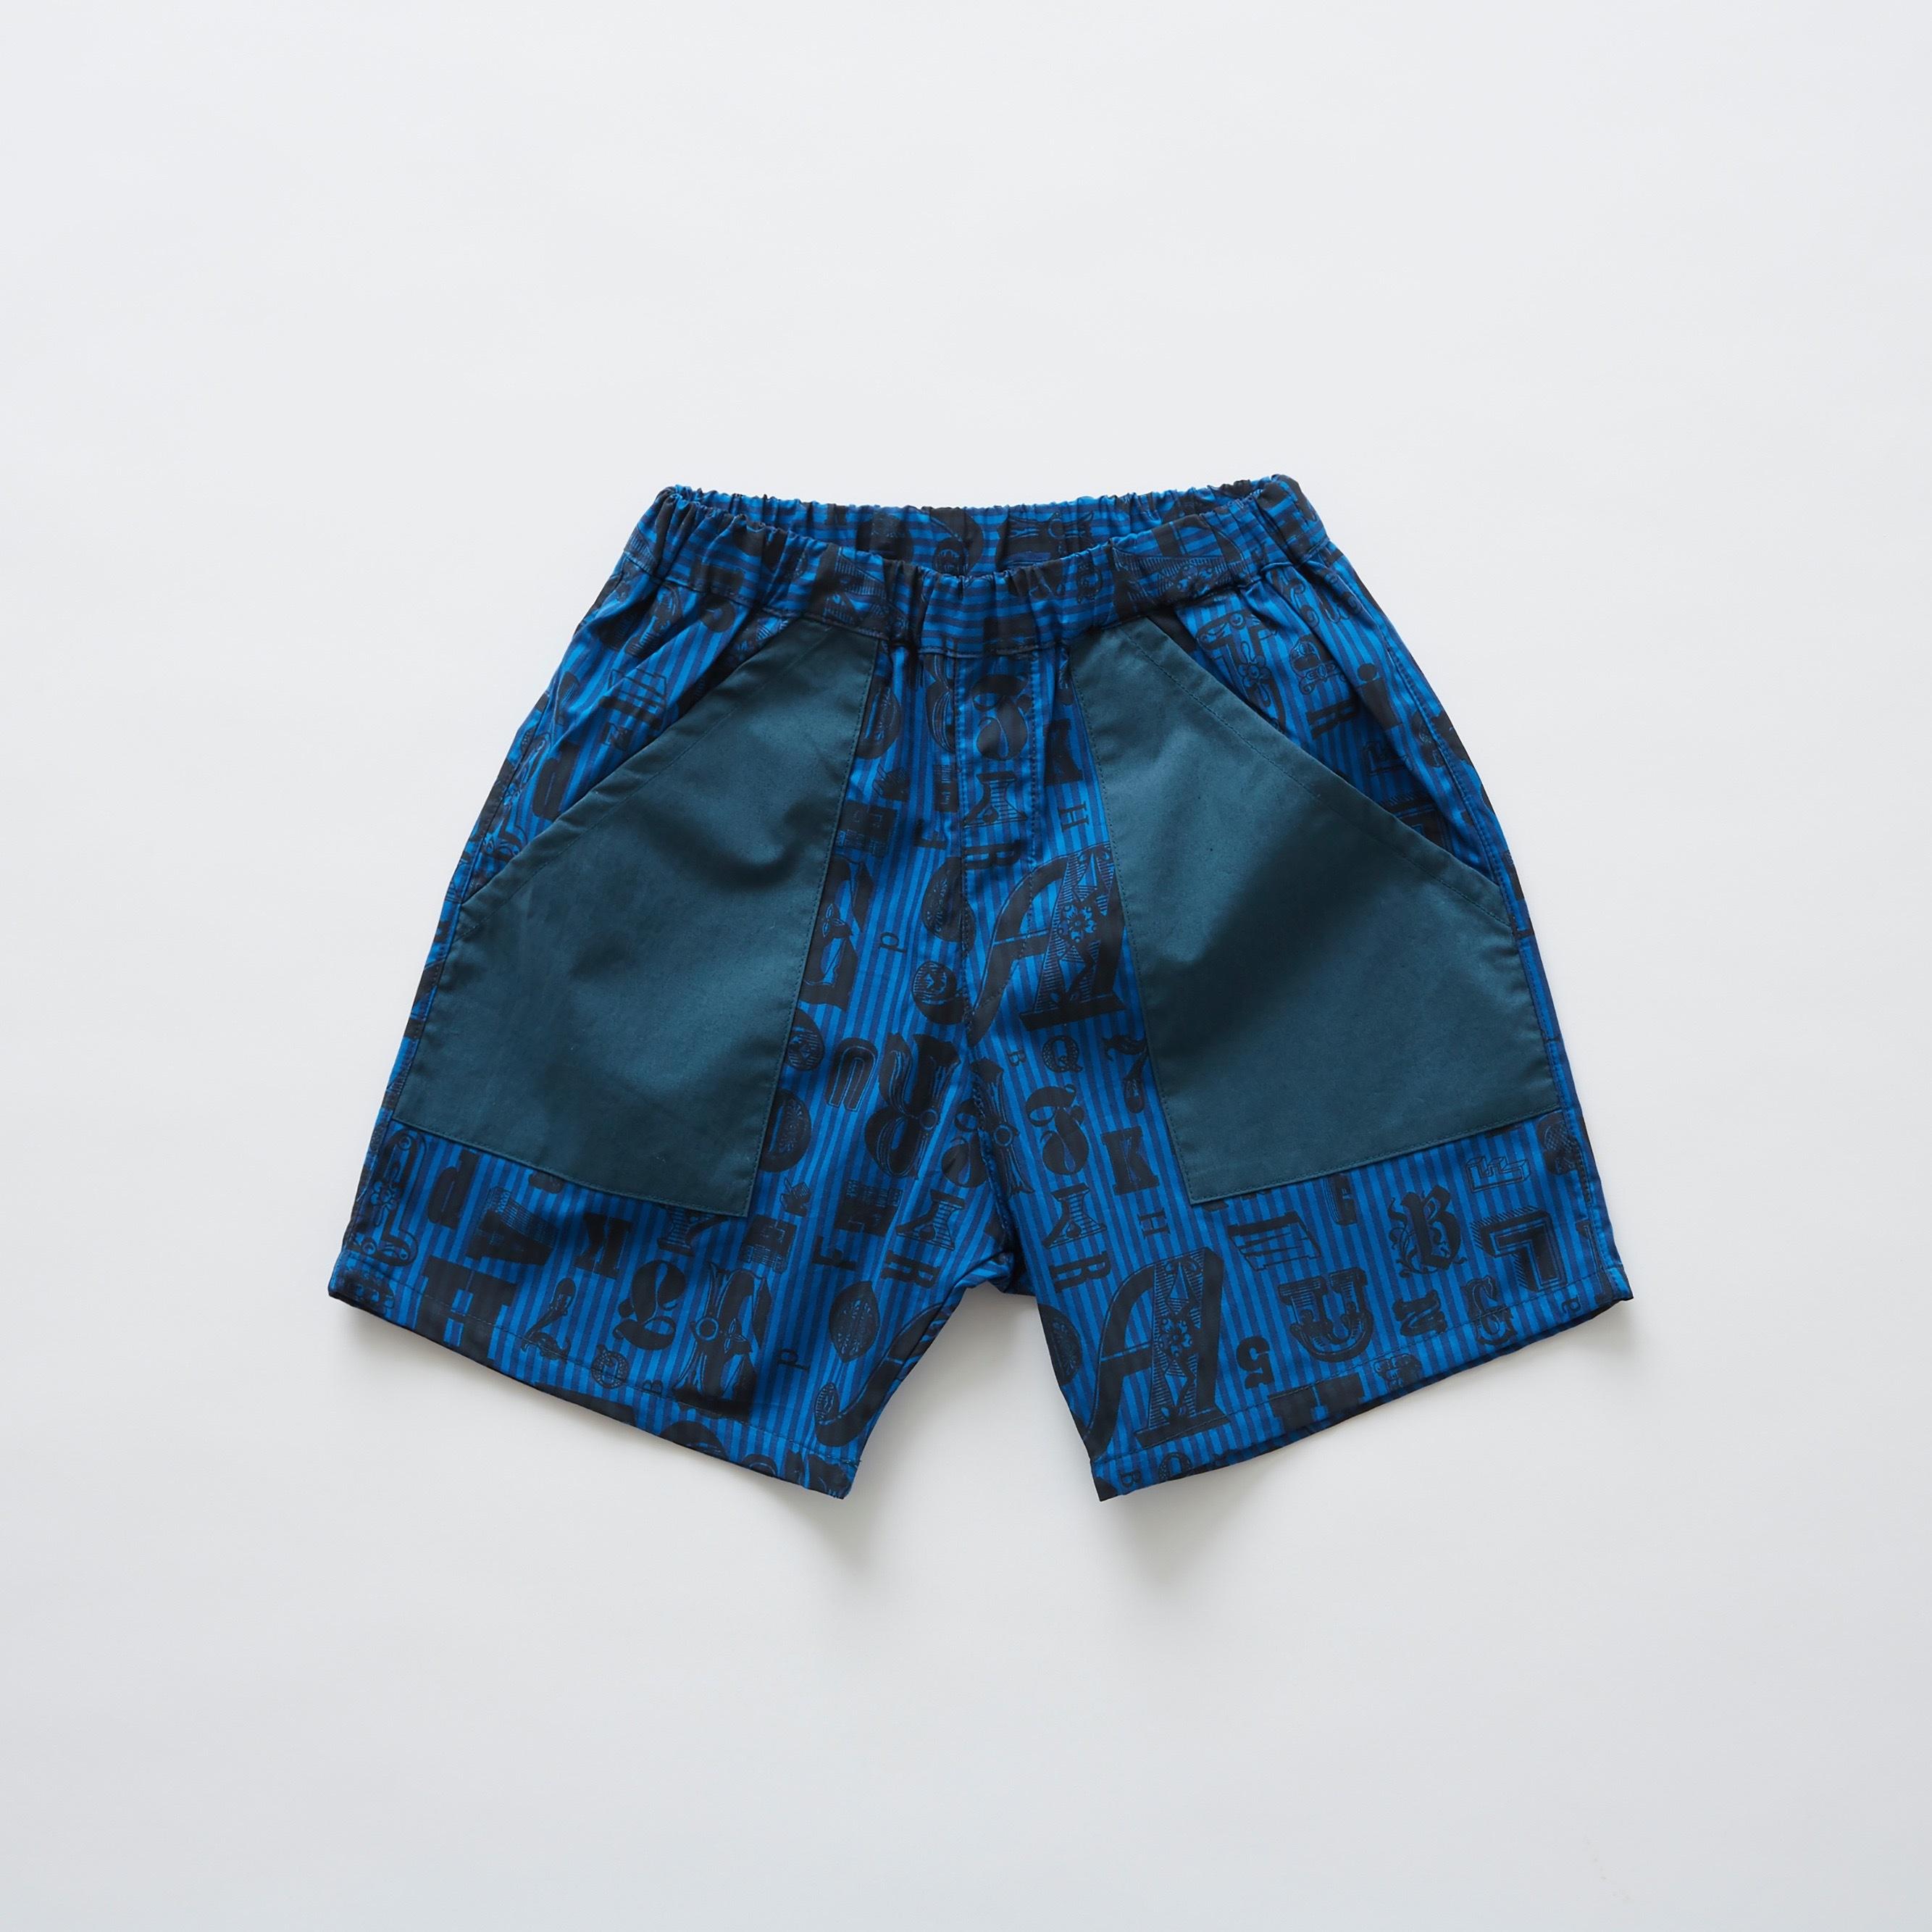 《eLfinFolk 2019SS》stripe × alphabetic print shorts / blue / 140cm